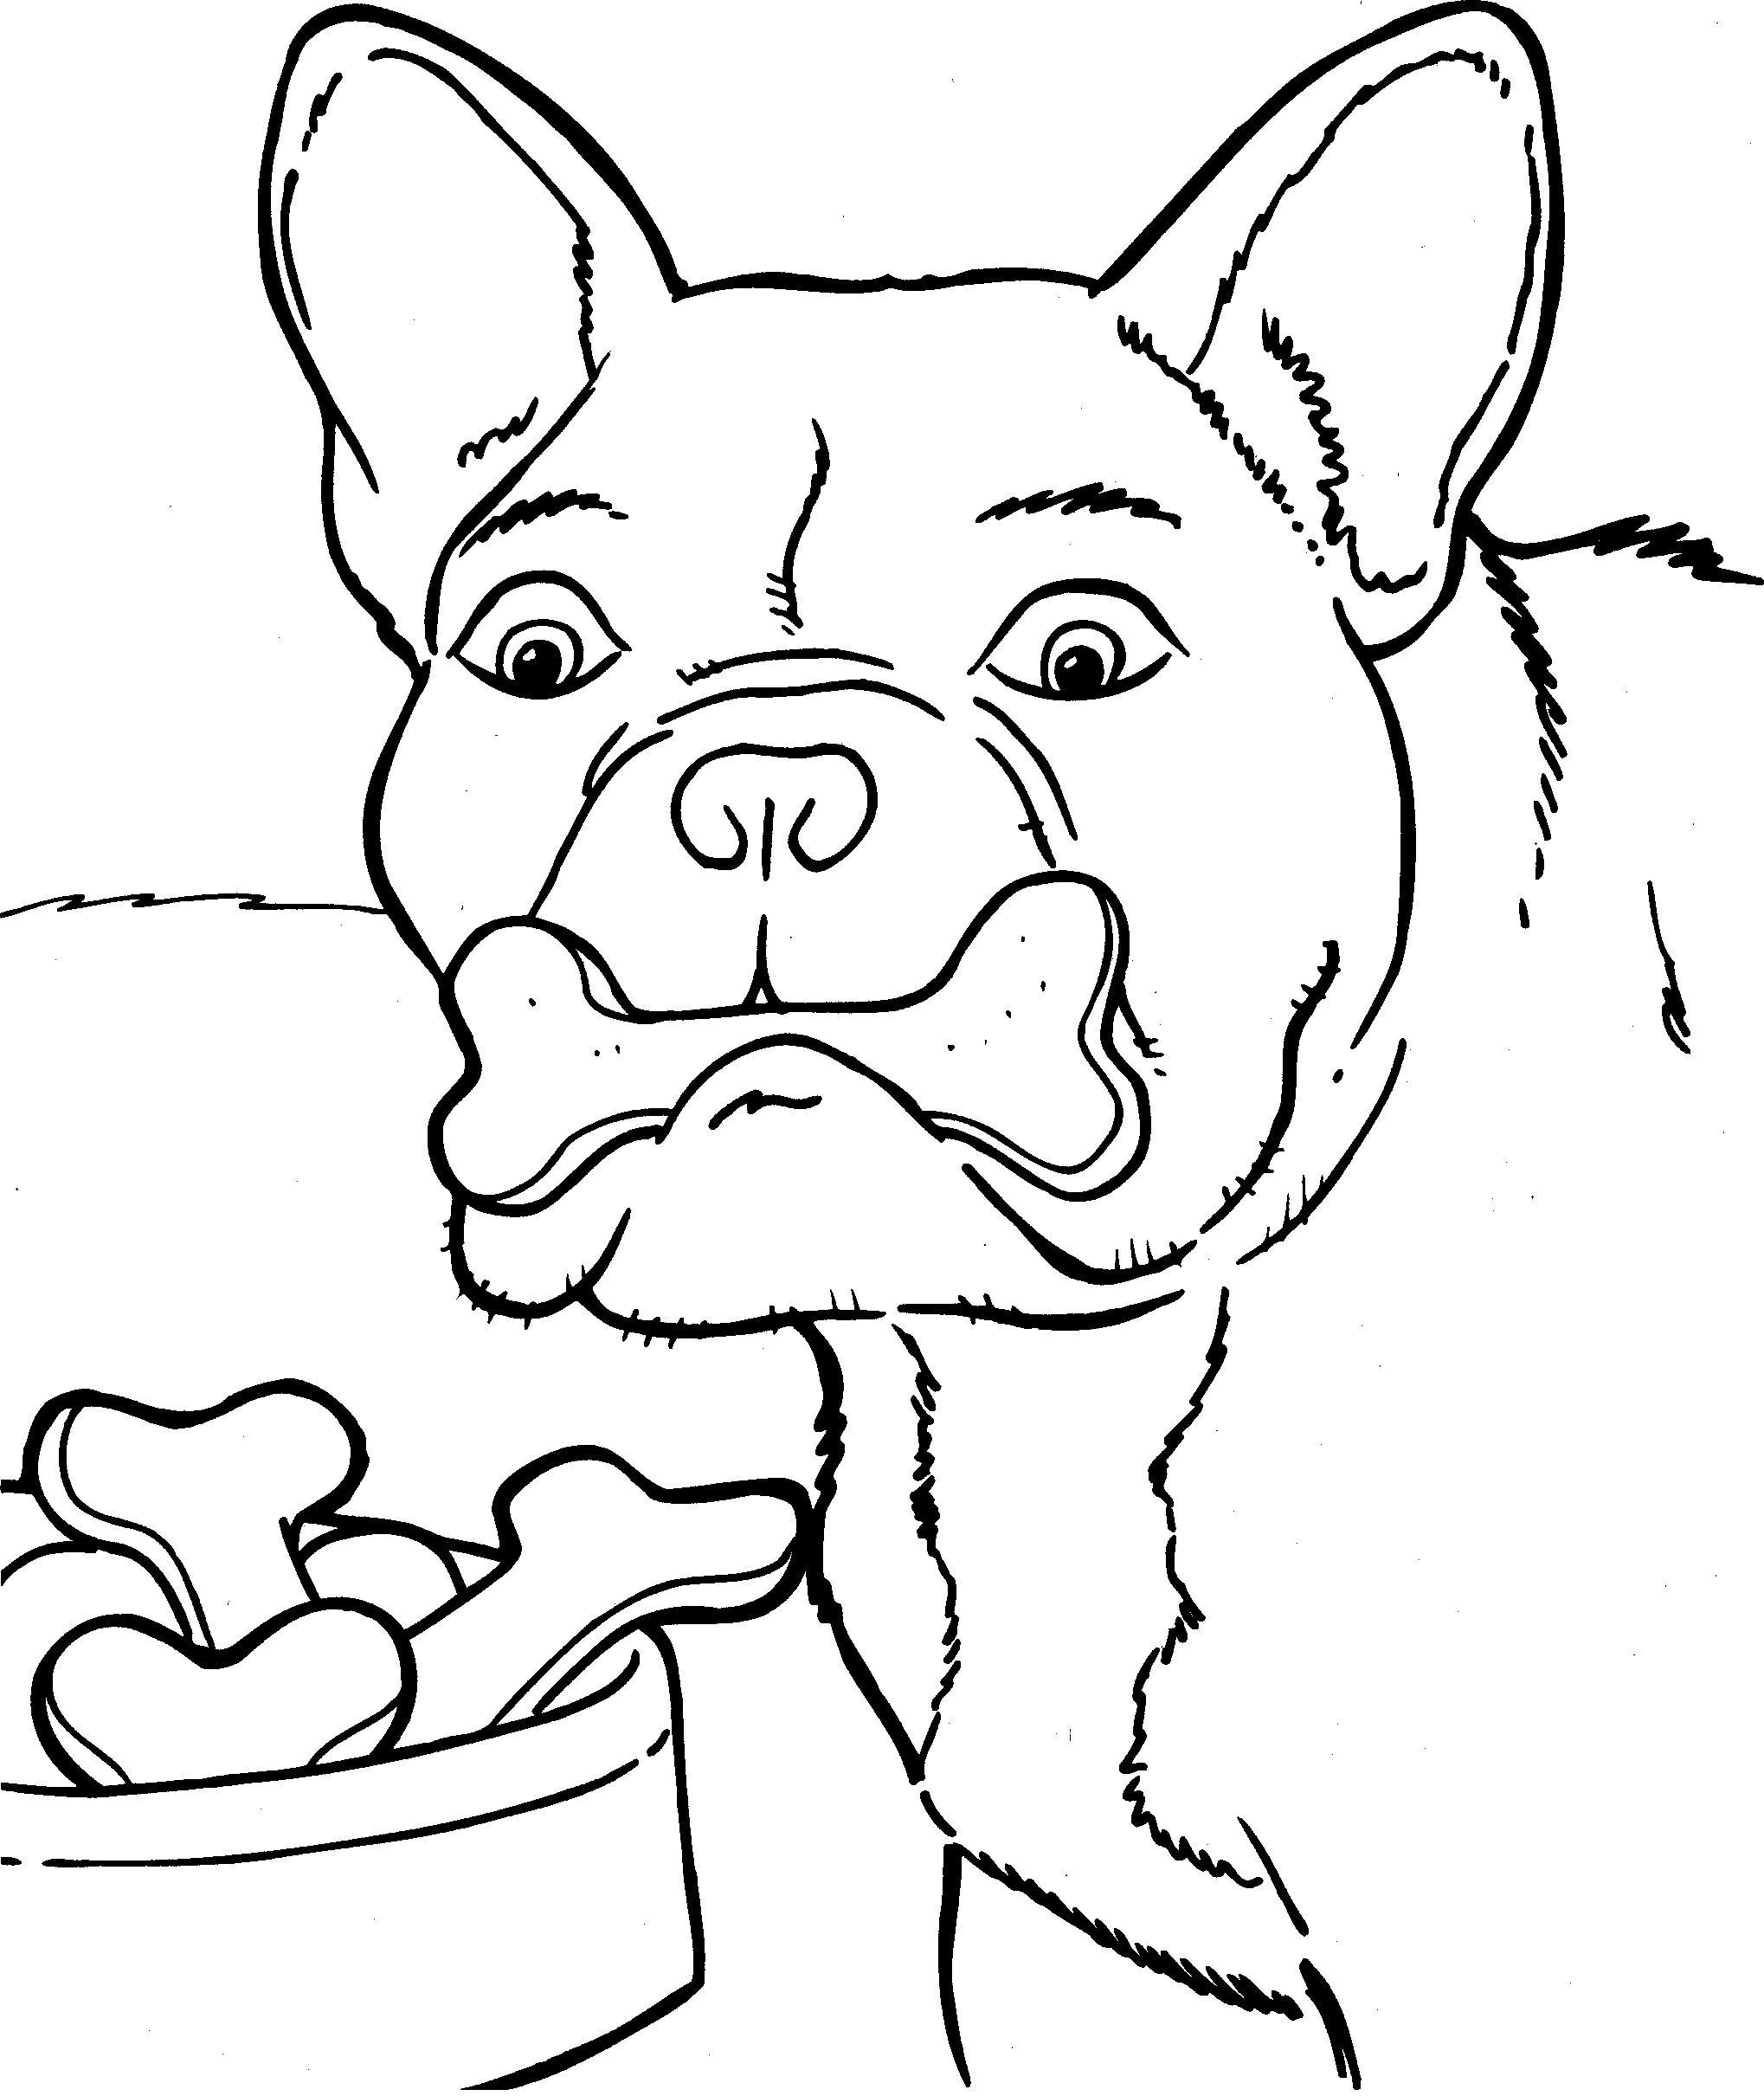 Kleurplaat Honden Kleurplaat 8867 Dog Coloring Page Coloring Pages Dog Pattern